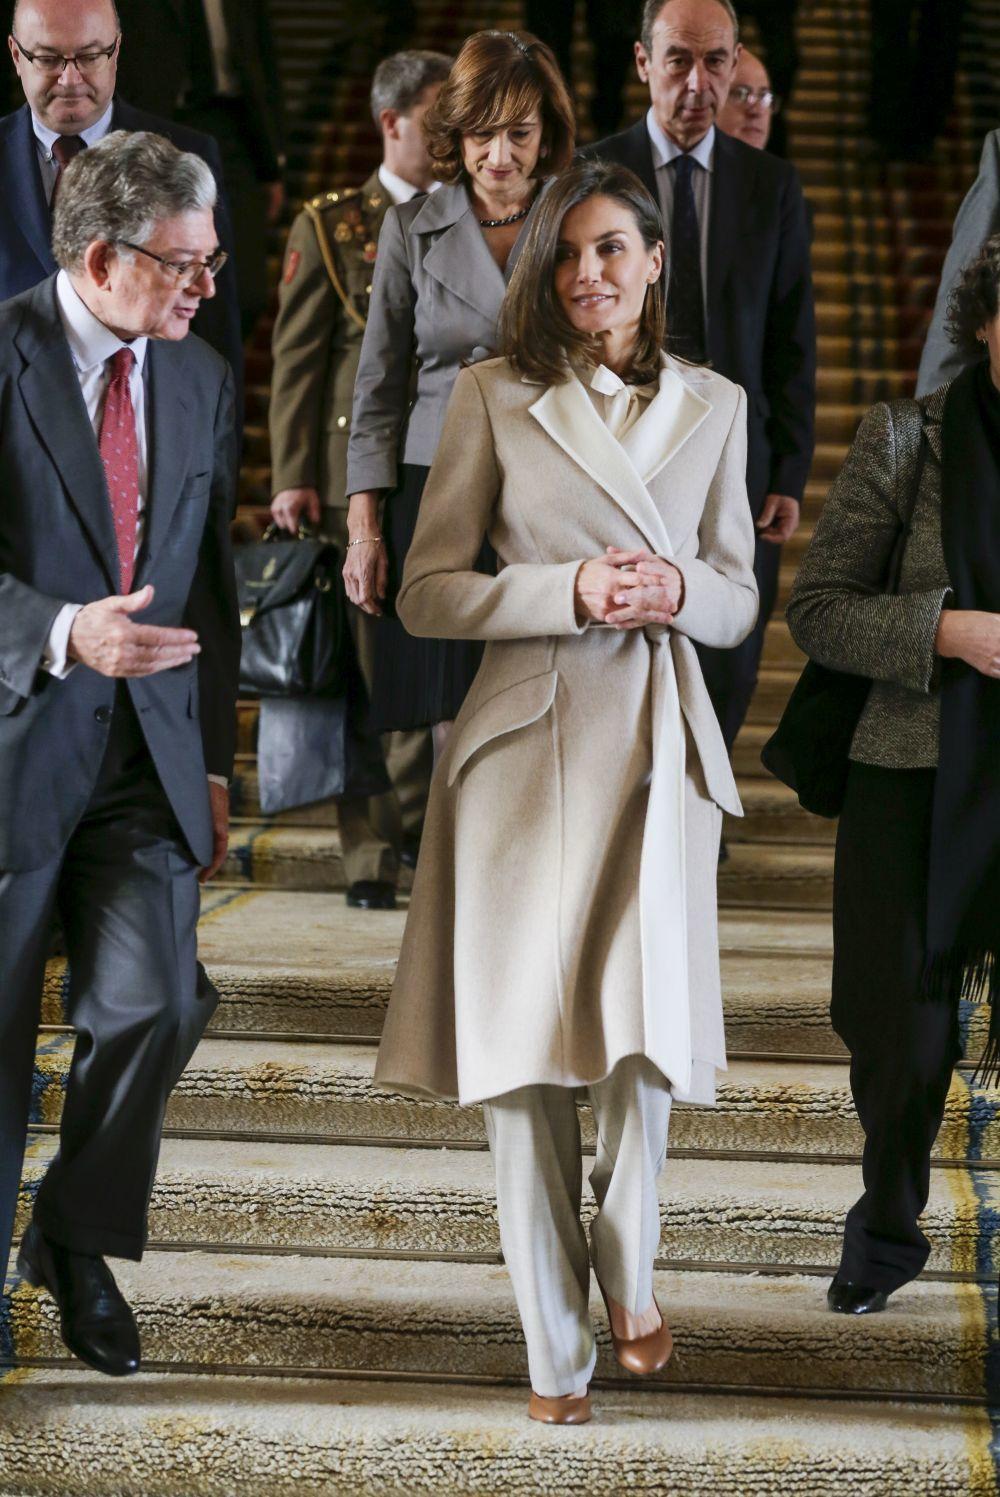 La aristócrata apostó por Carolina Herrera y Hugo Boss